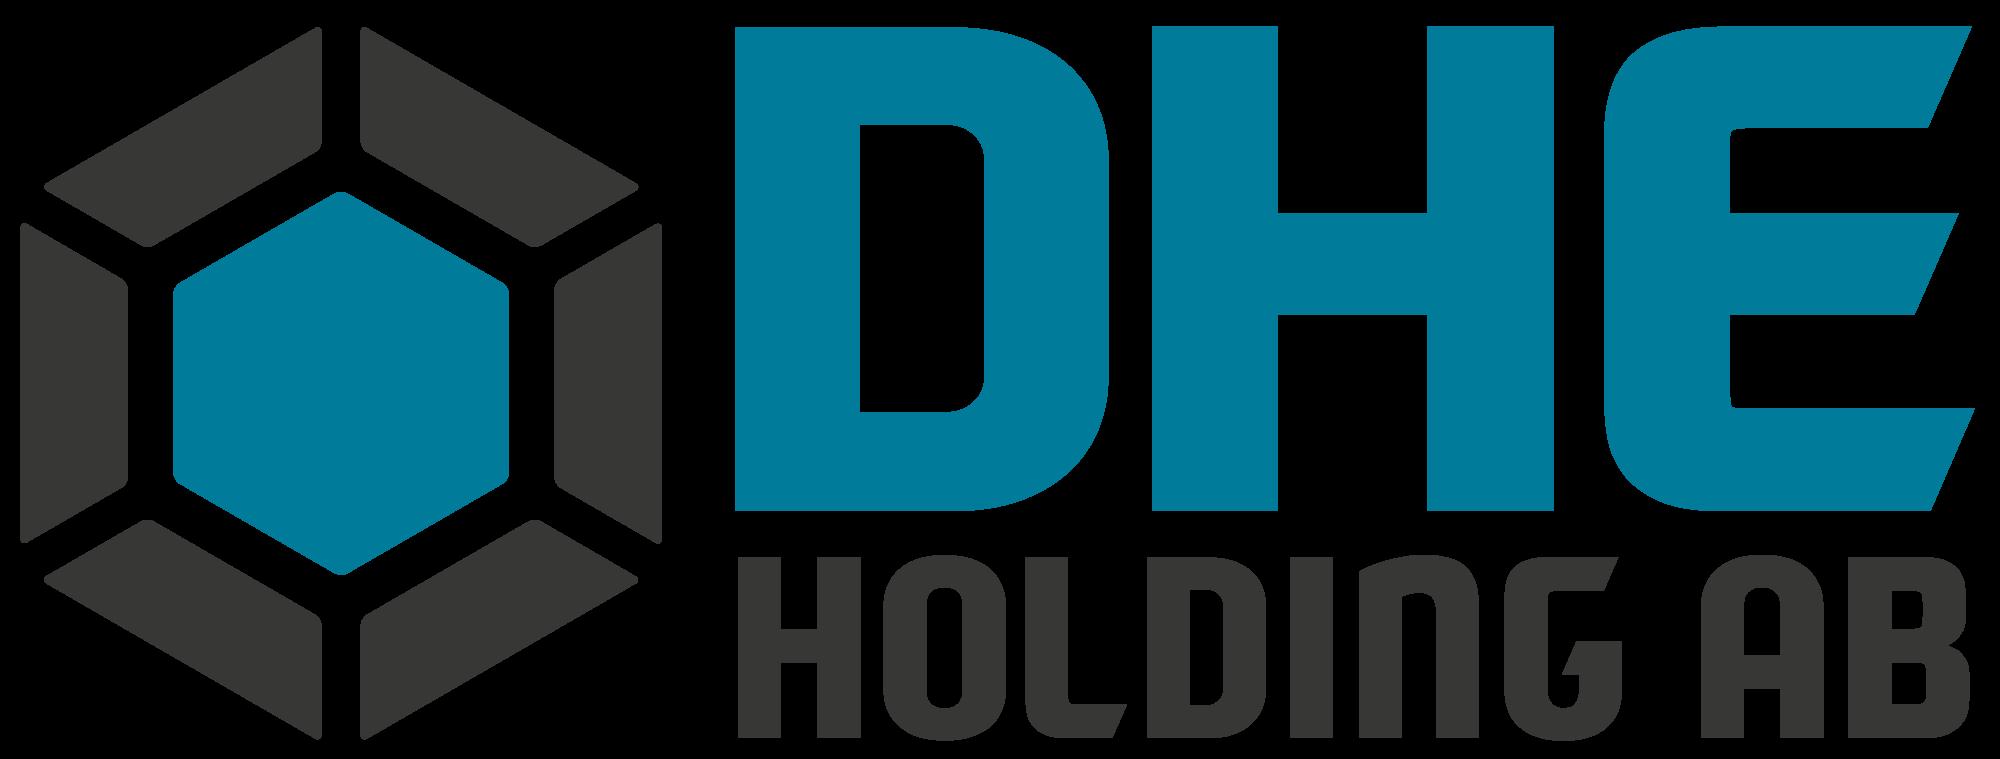 dhe_holding_logo_blue_gray_2015